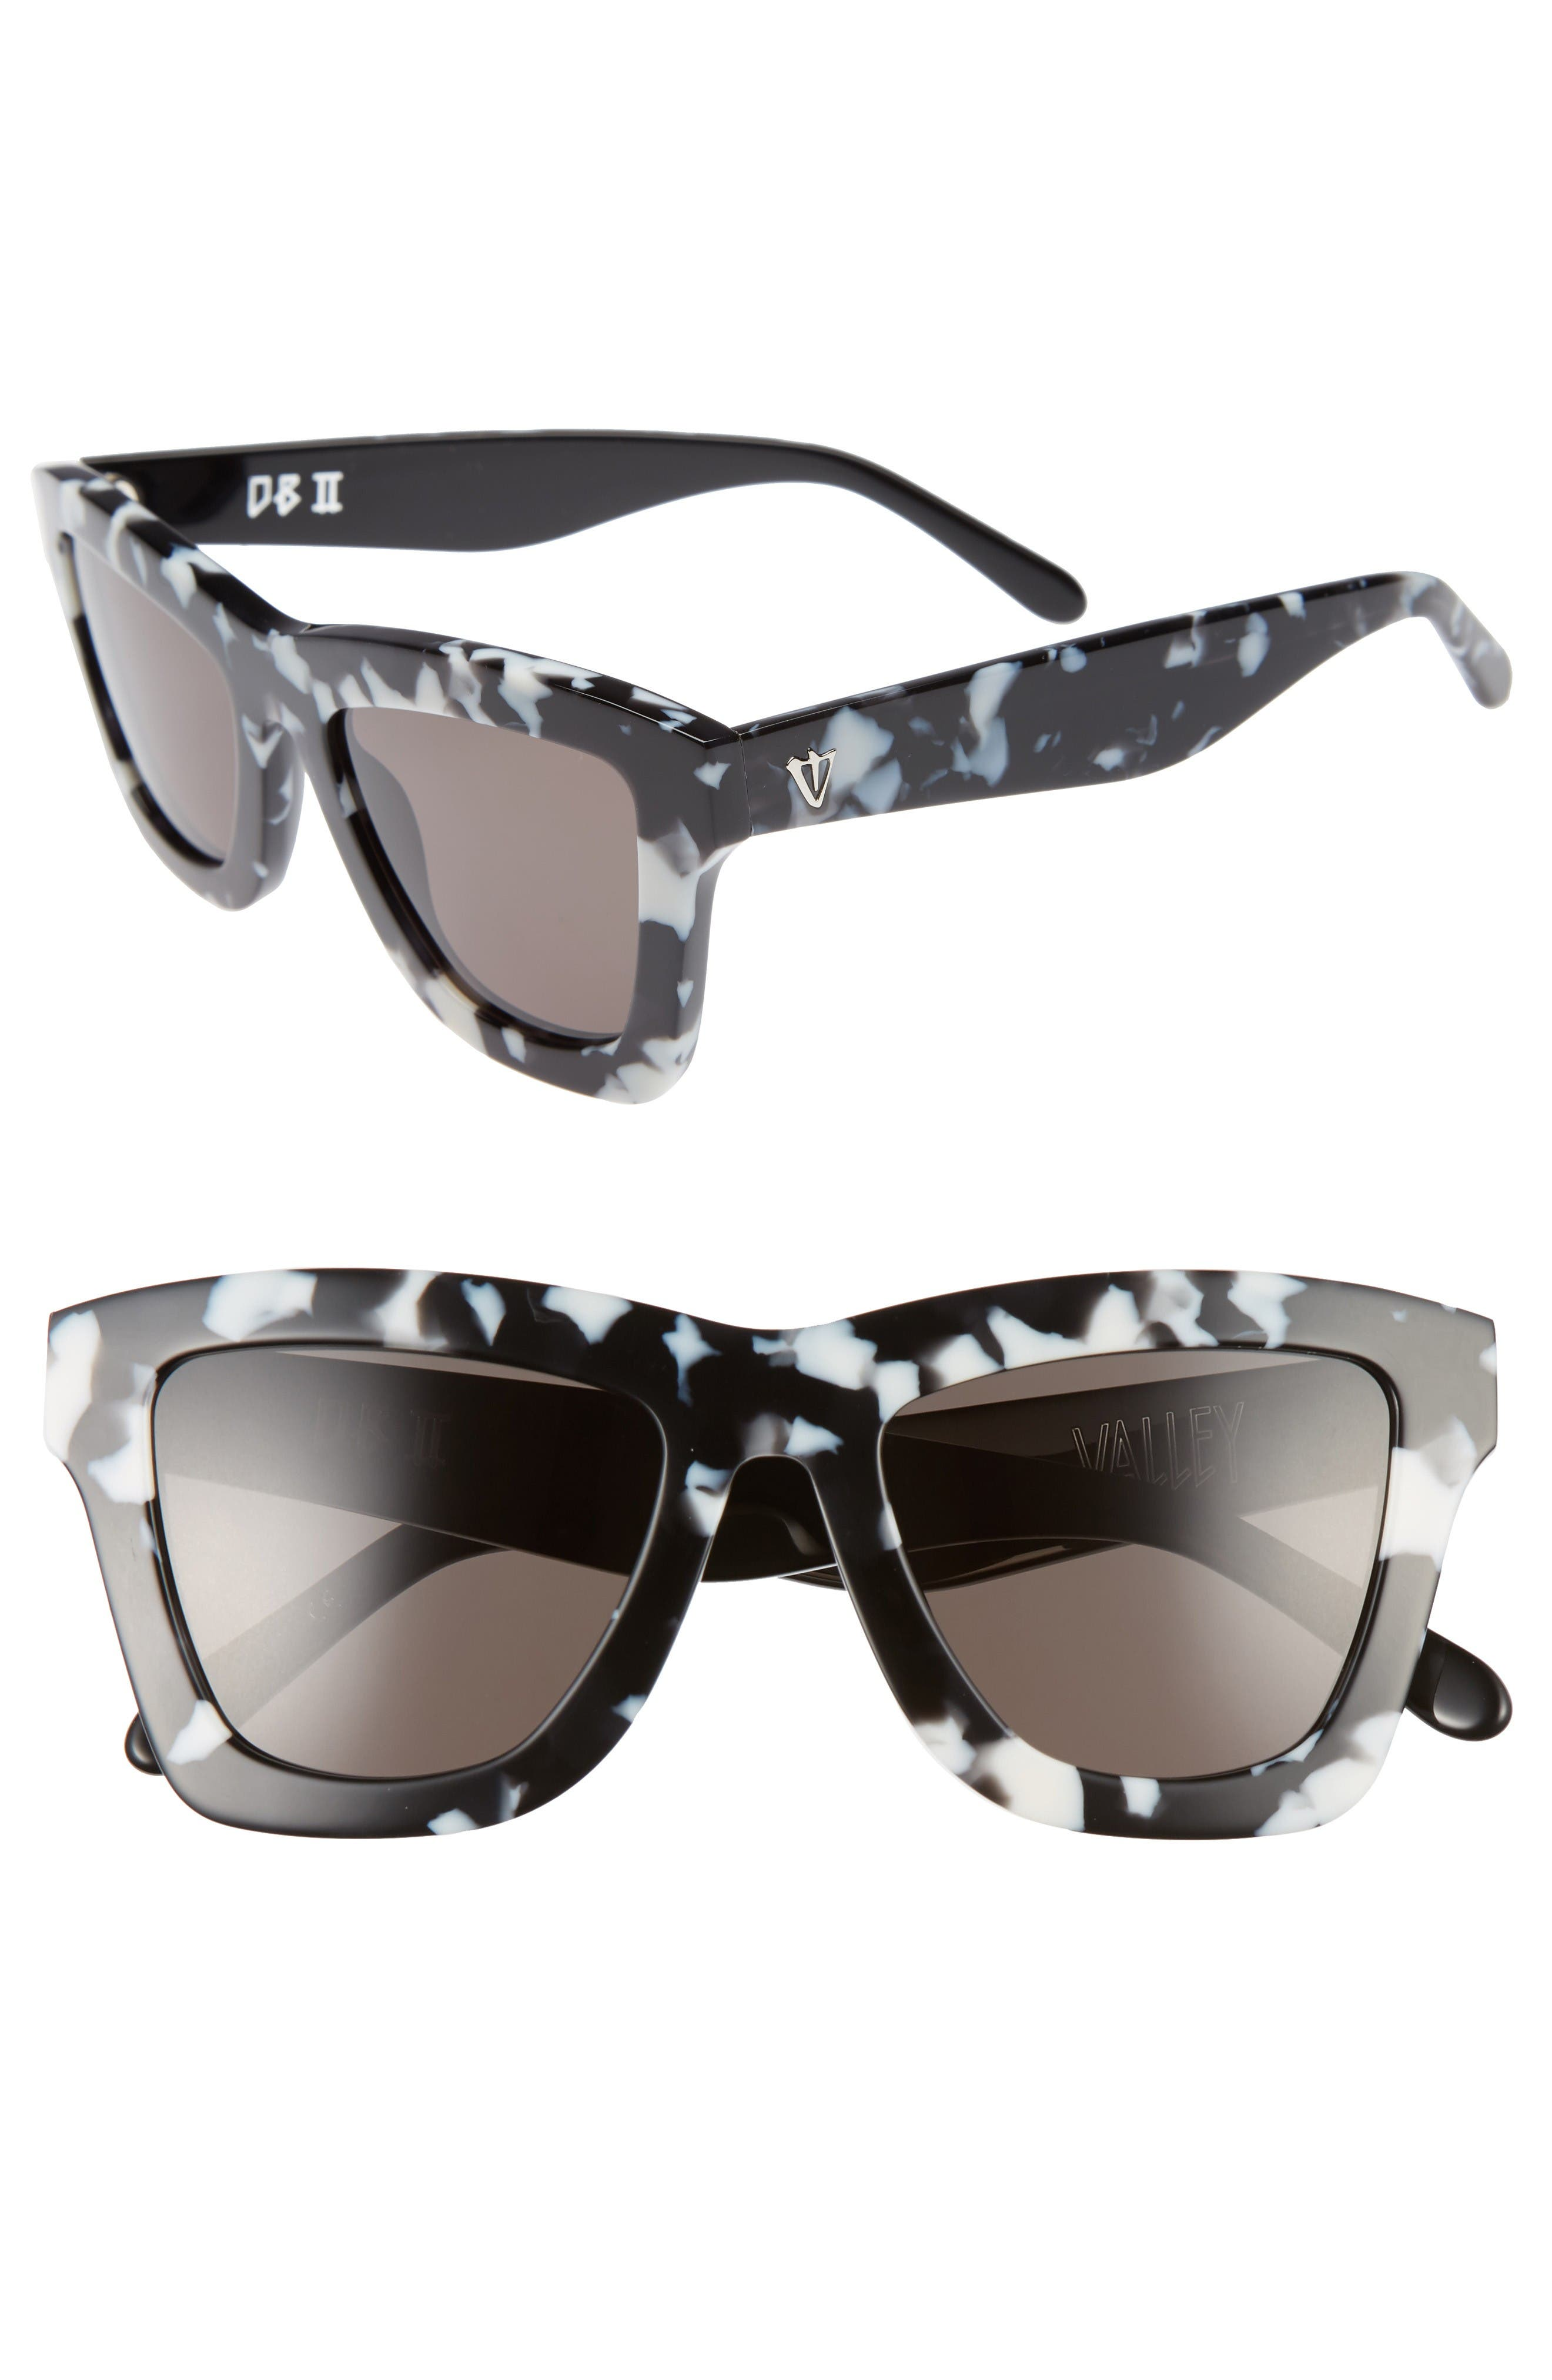 DB II 50mm Retro Sunglasses,                         Main,                         color, Black Marble/ Black